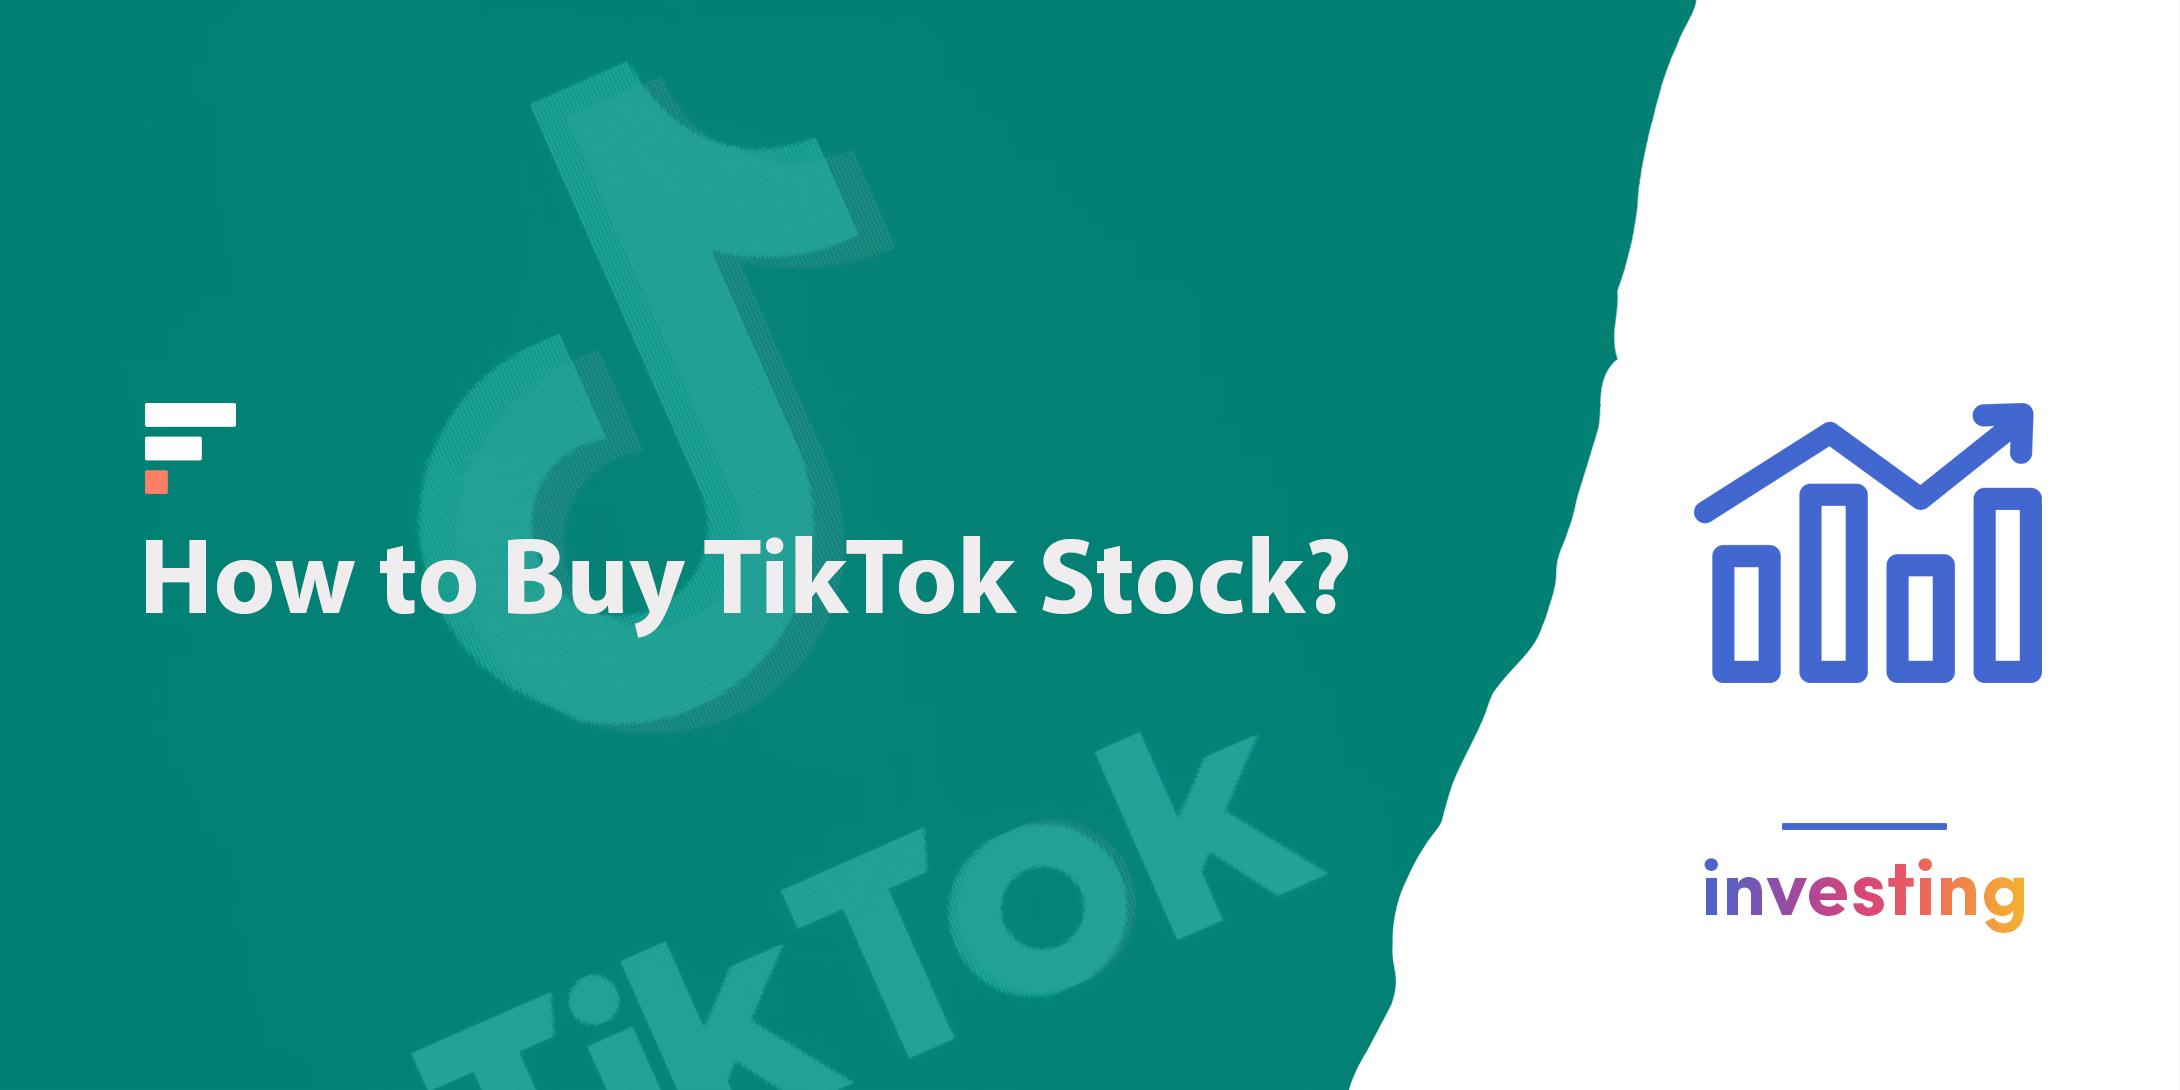 How to buy TikTok stock?